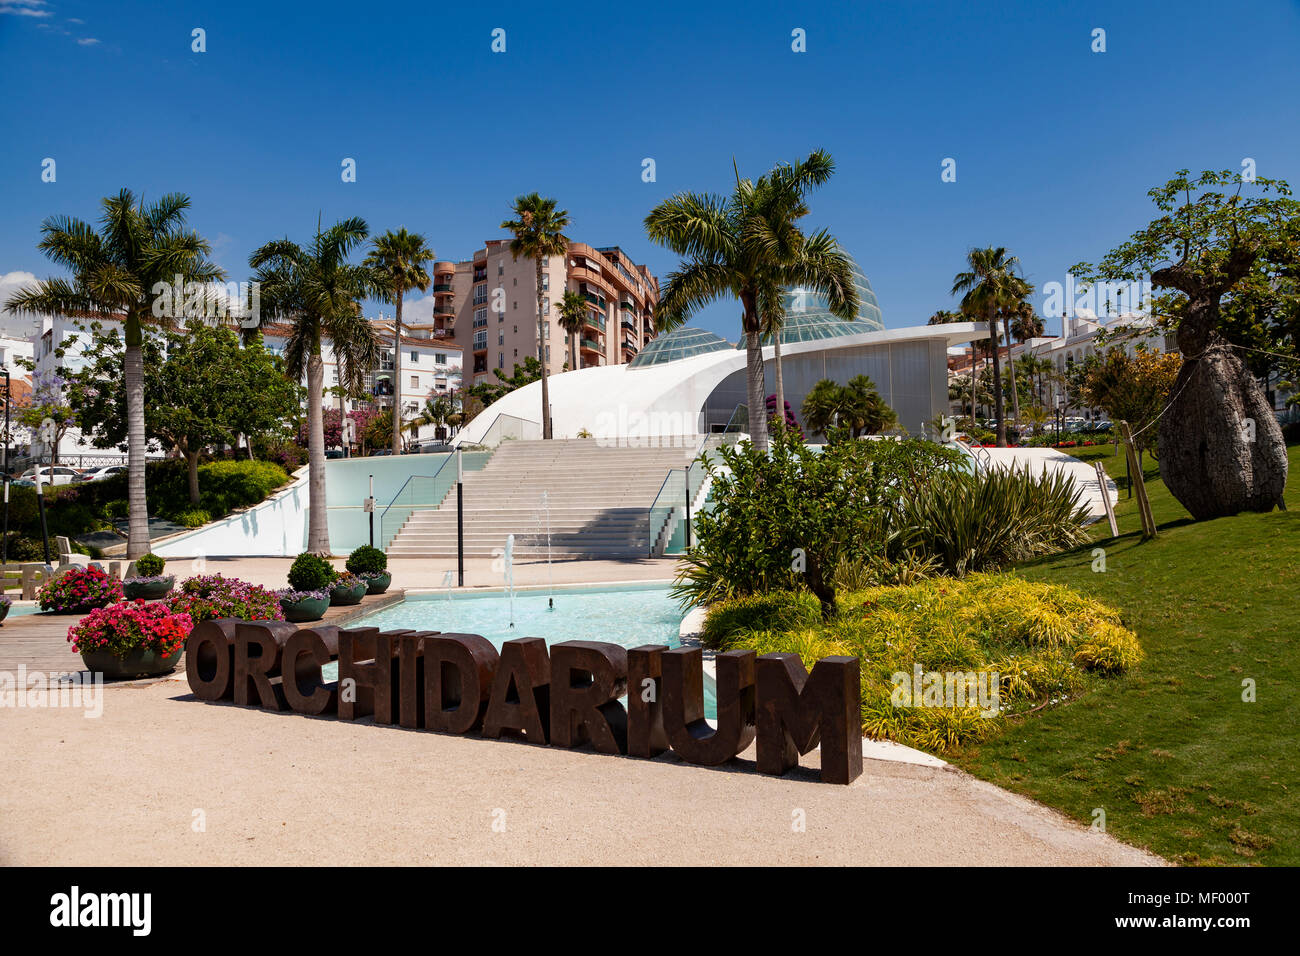 The Orchidarium, Estepona, Malaga, Spain - Stock Image